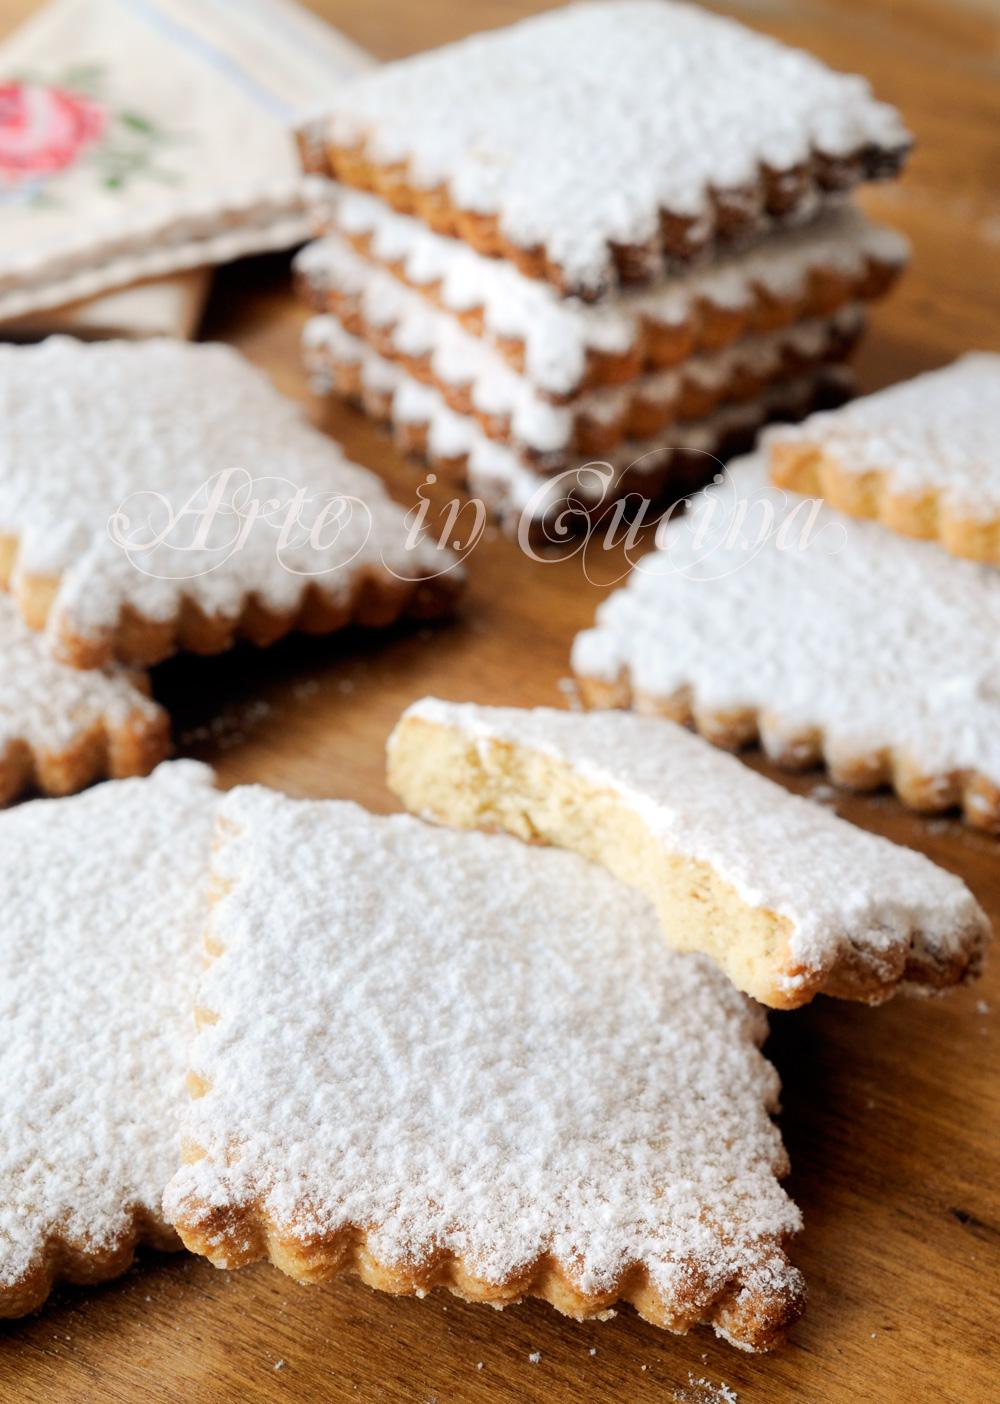 Biscotti Di Natale Tedeschi Ricetta.Spekulatius O Speculoos Biscotti Natalizi Tedeschi